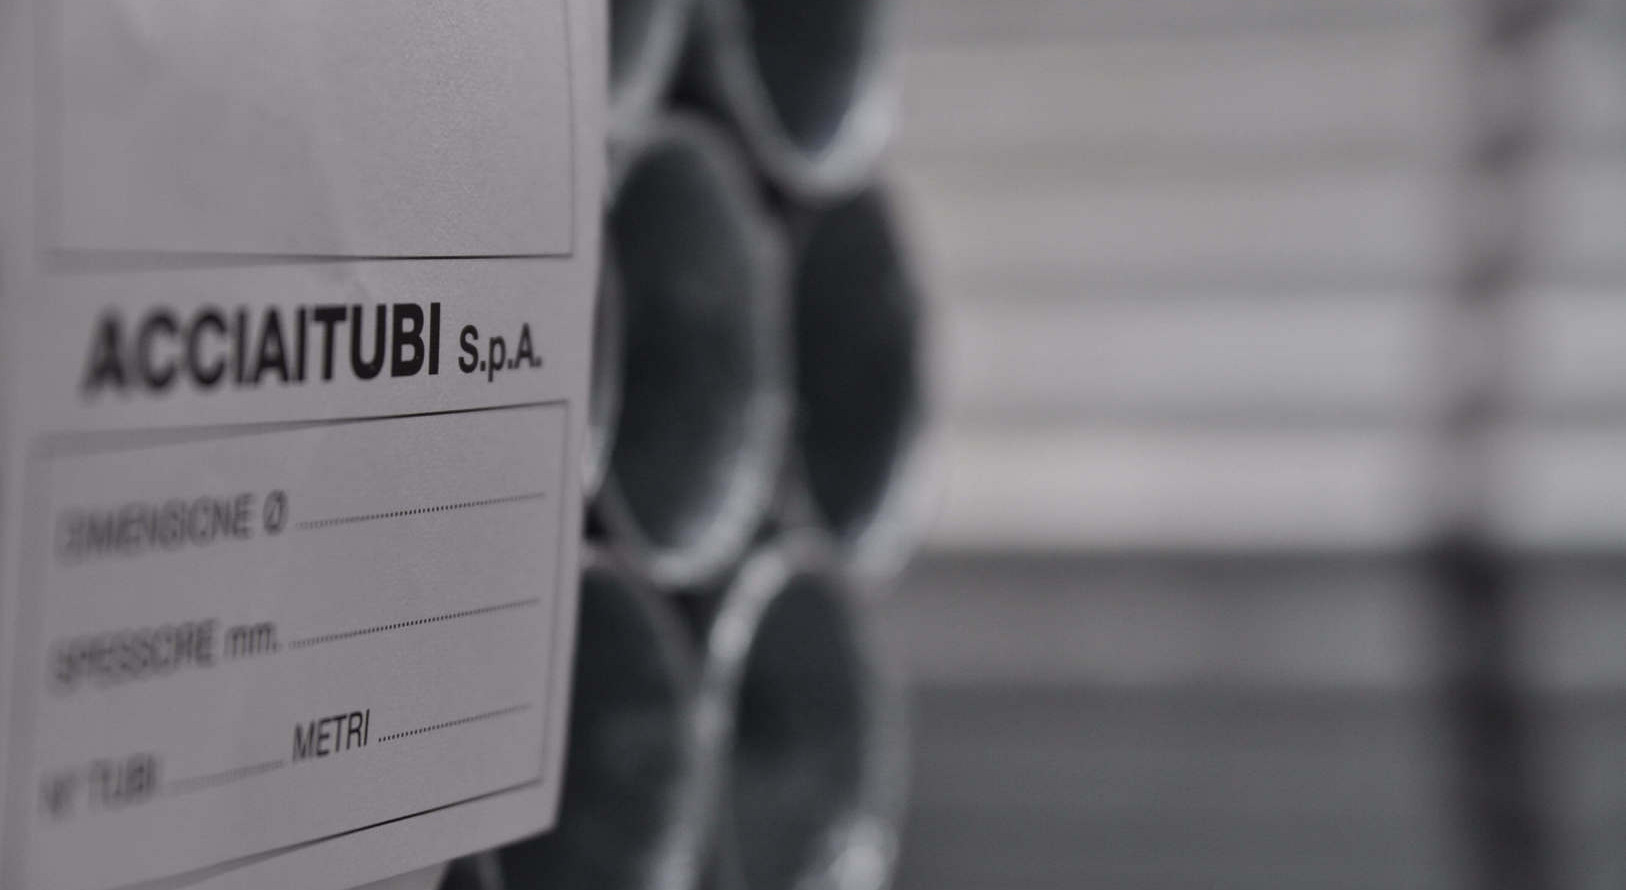 Certificazione dei tubi in acciaio di Acciaitubi